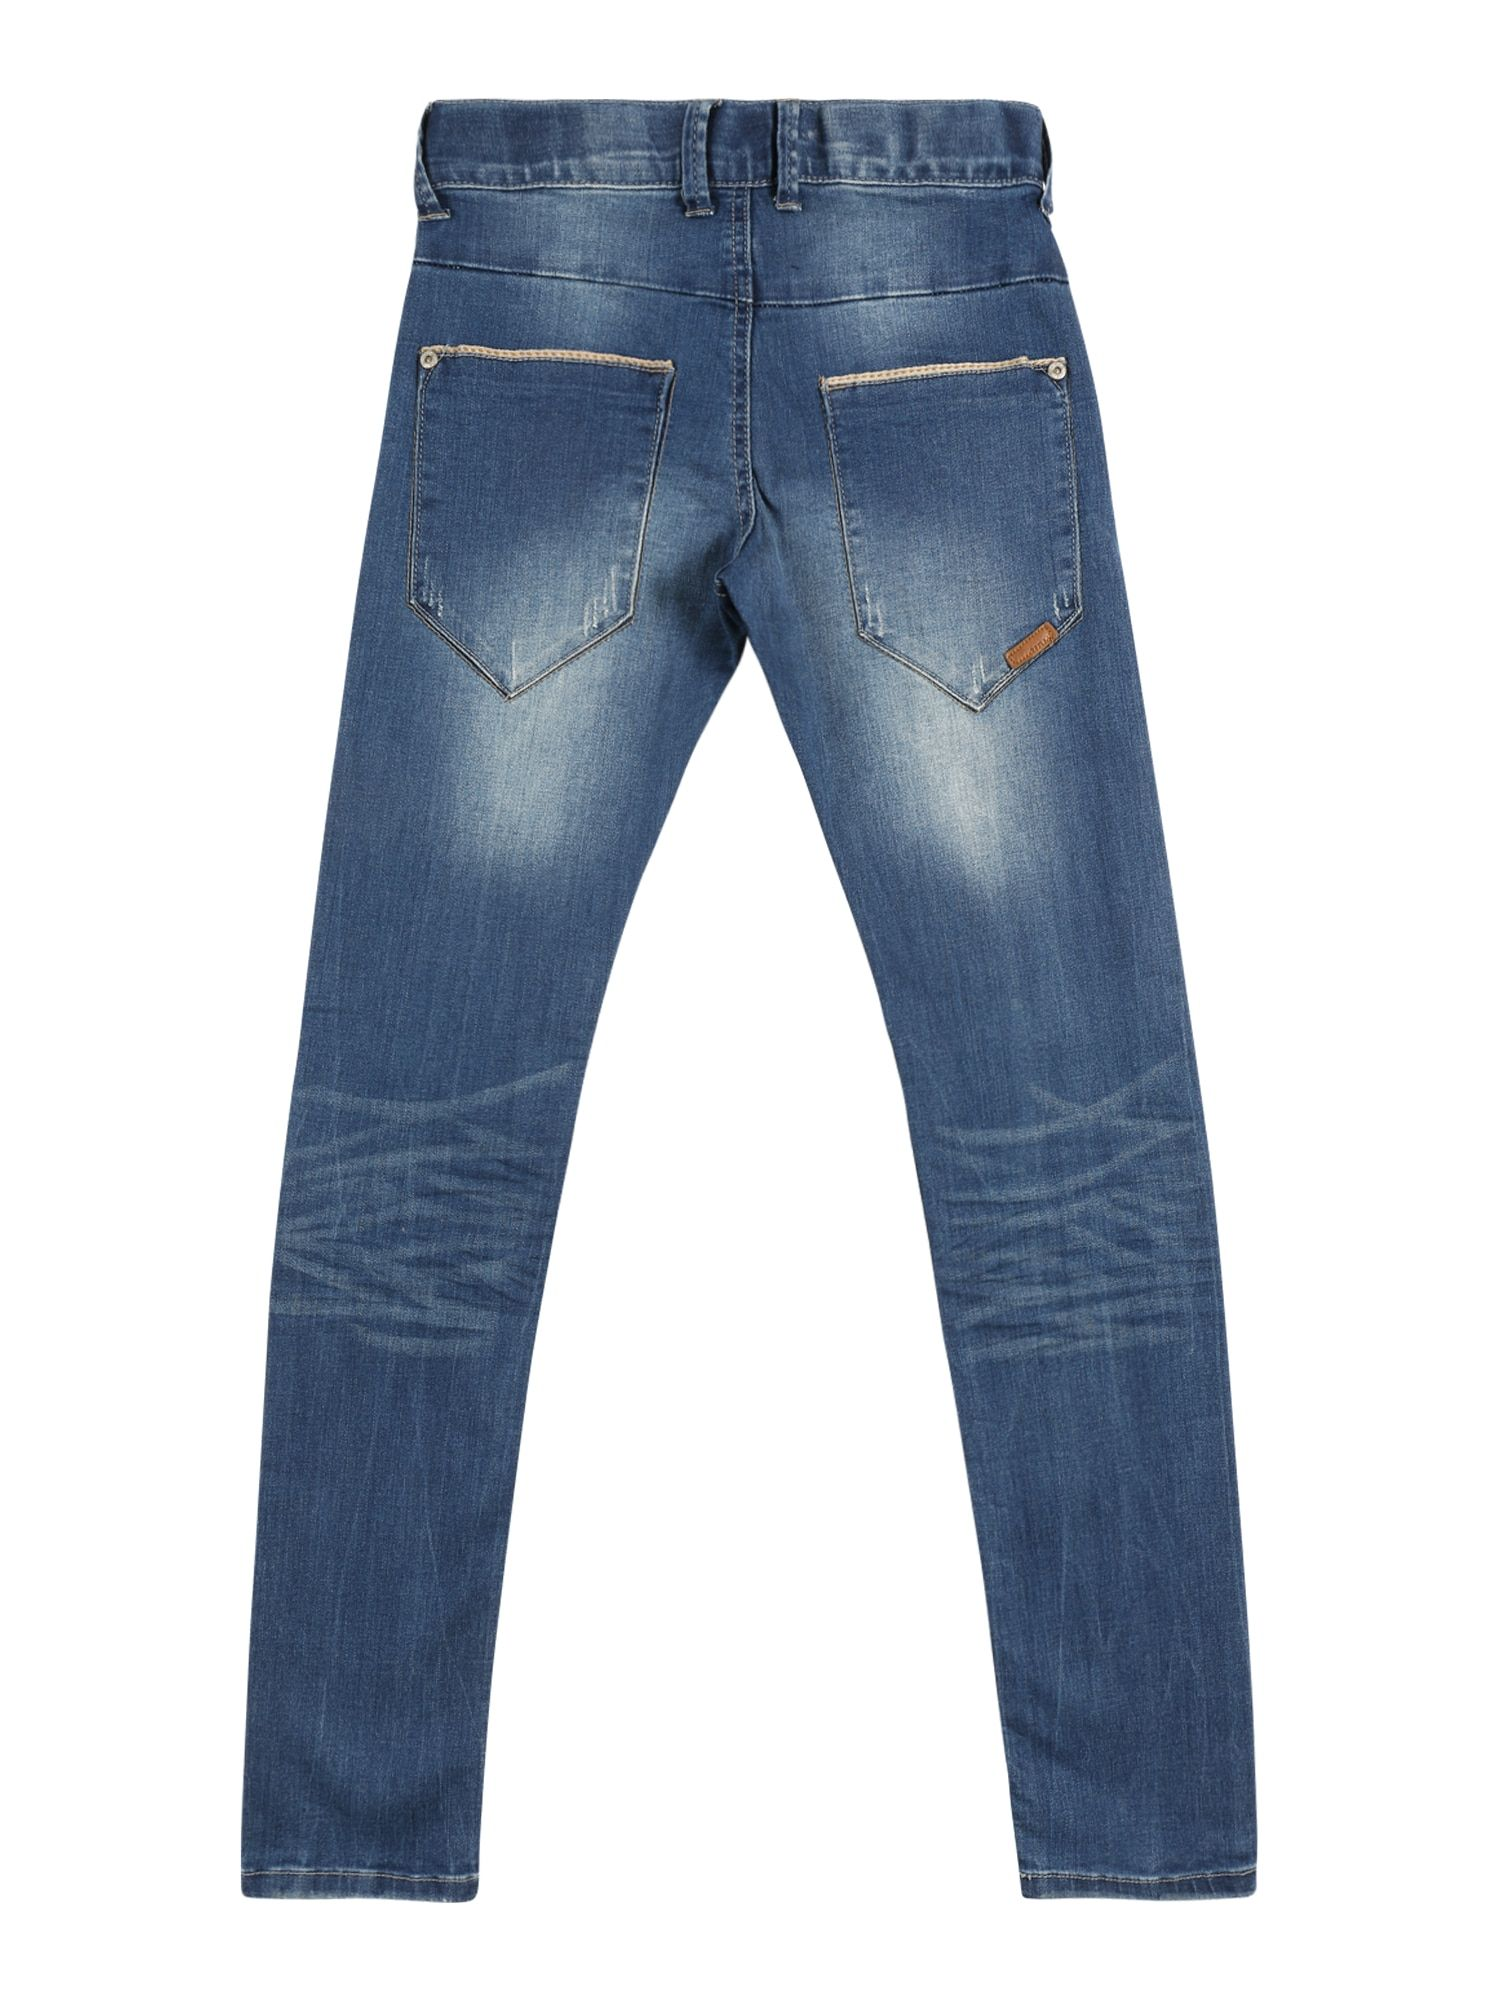 Name It Jeans Nittasmania Jungen Blau Grosse 104 Kinder Jeans Blaue Jeans Und Jeans